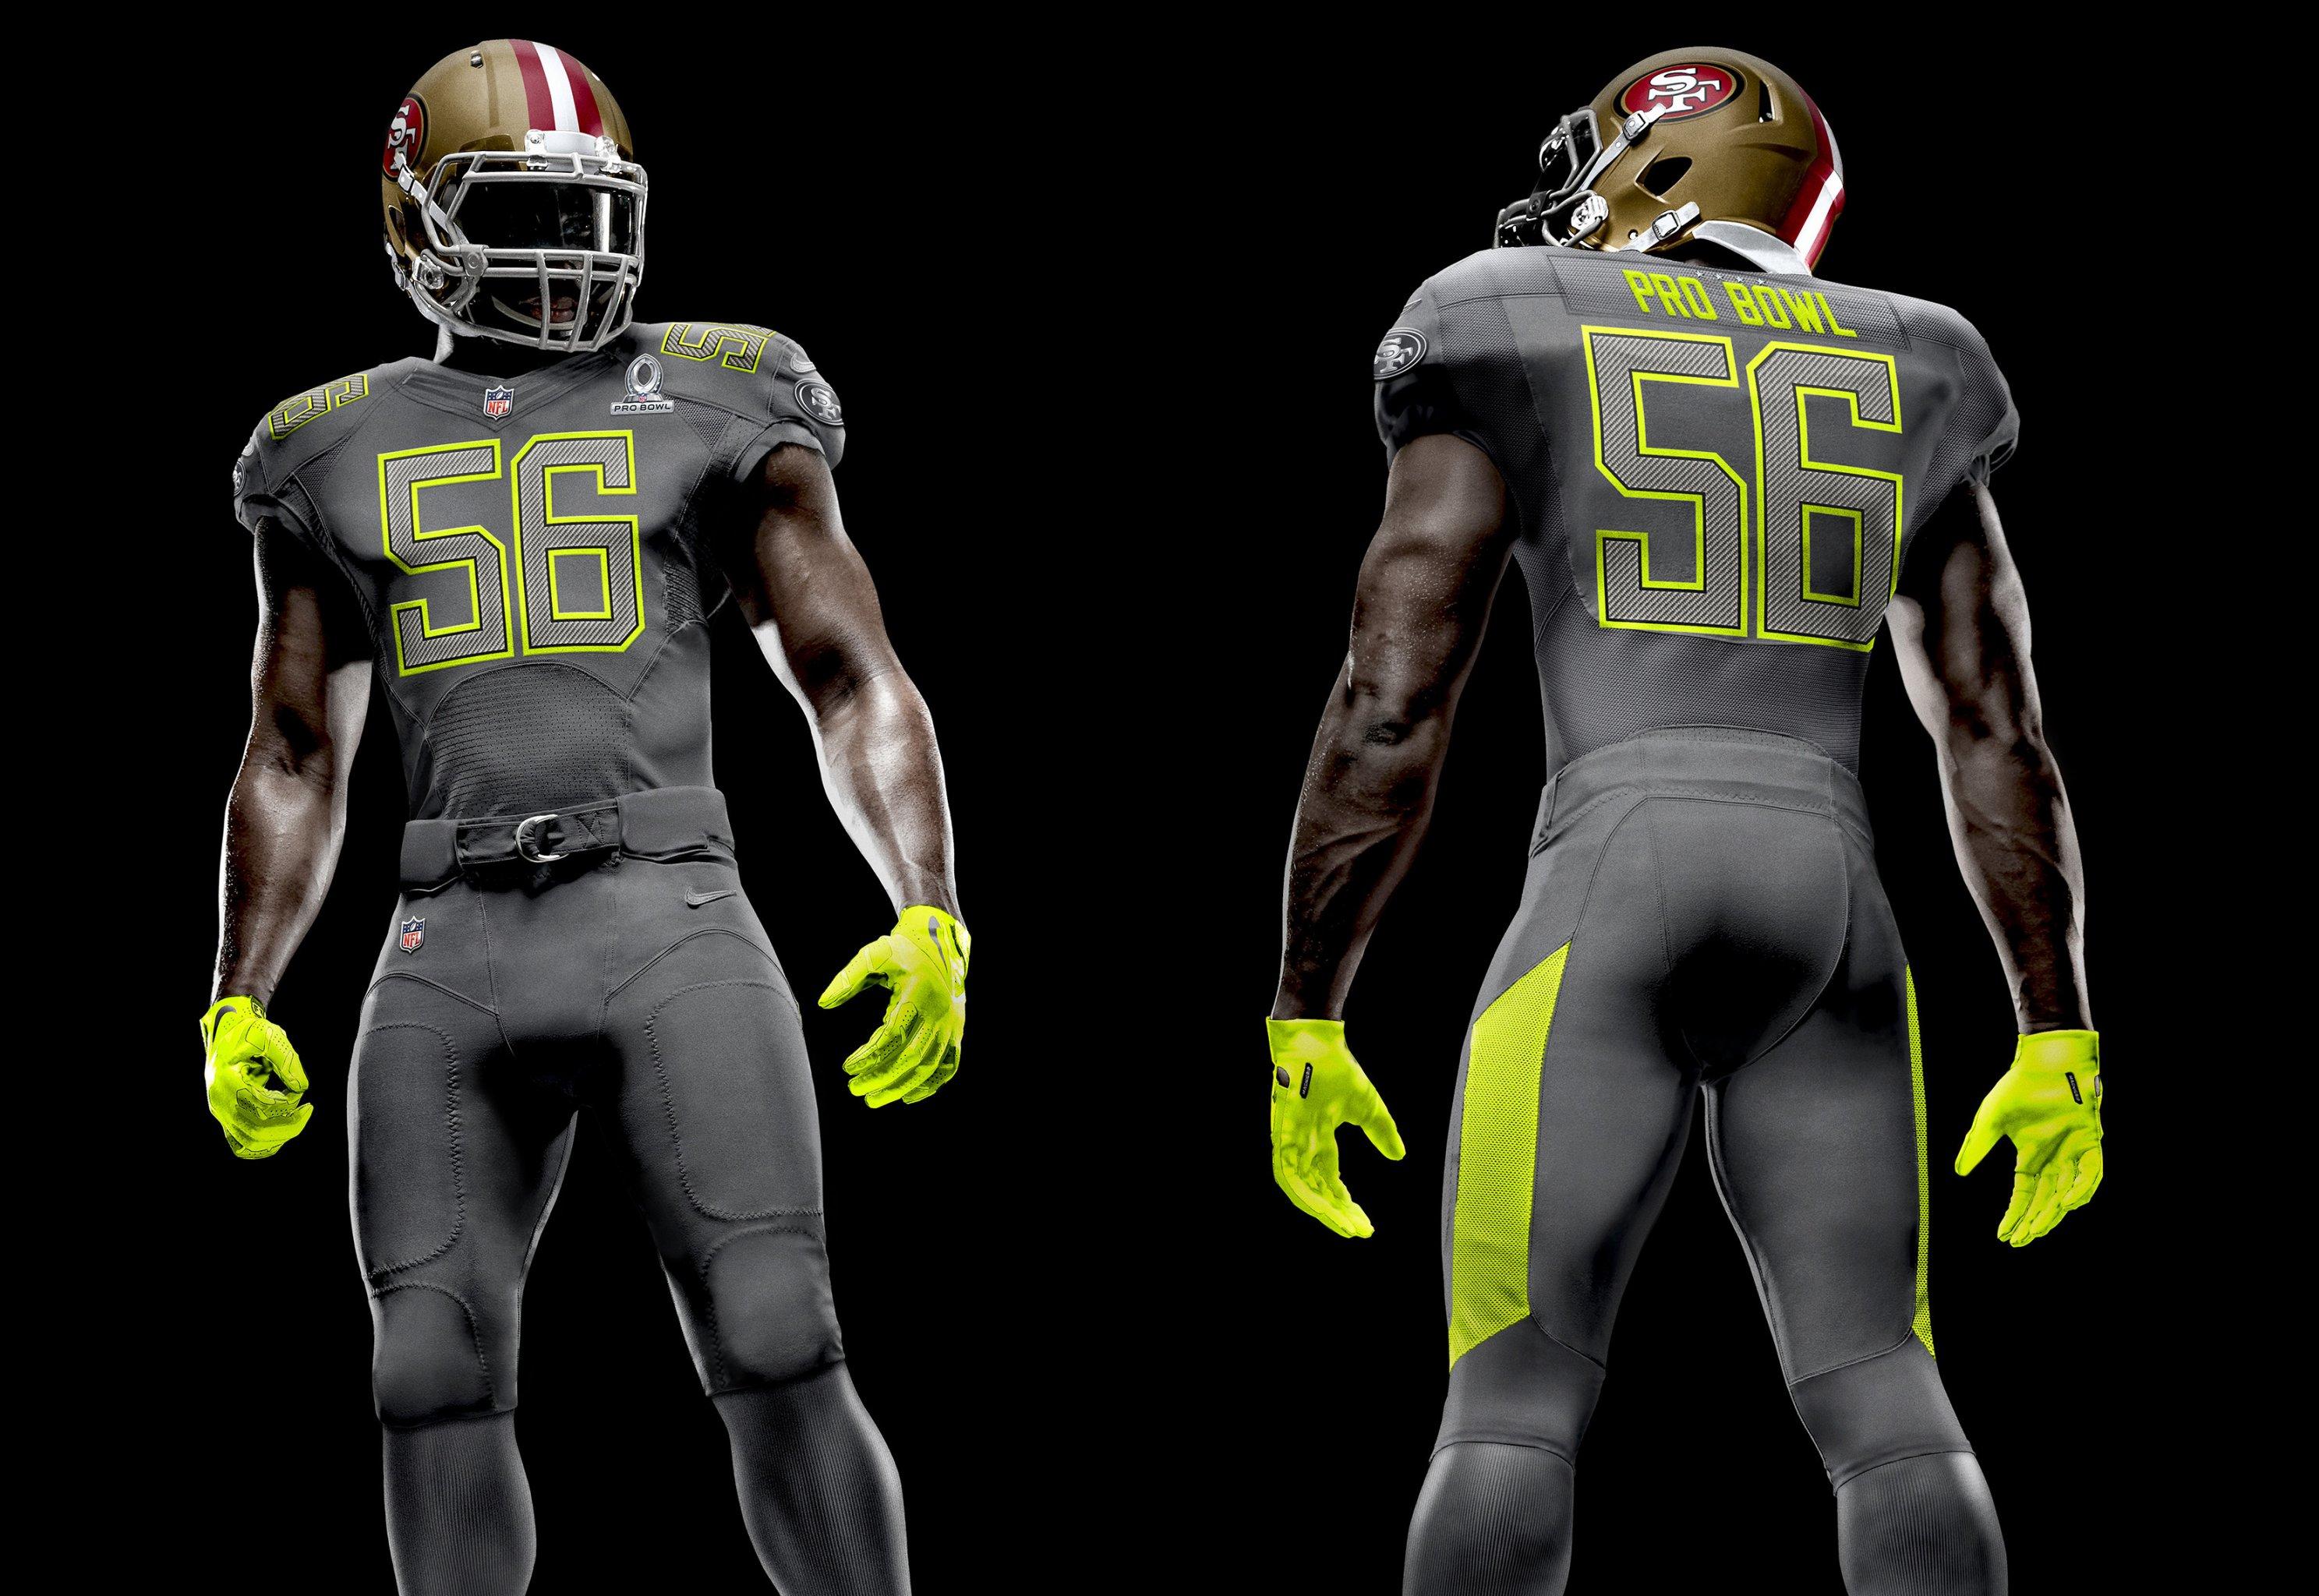 big sale 87620 ca26f NFL Nike Elite 51 Uniforms Revealed for 2014 Pro Bowl ...